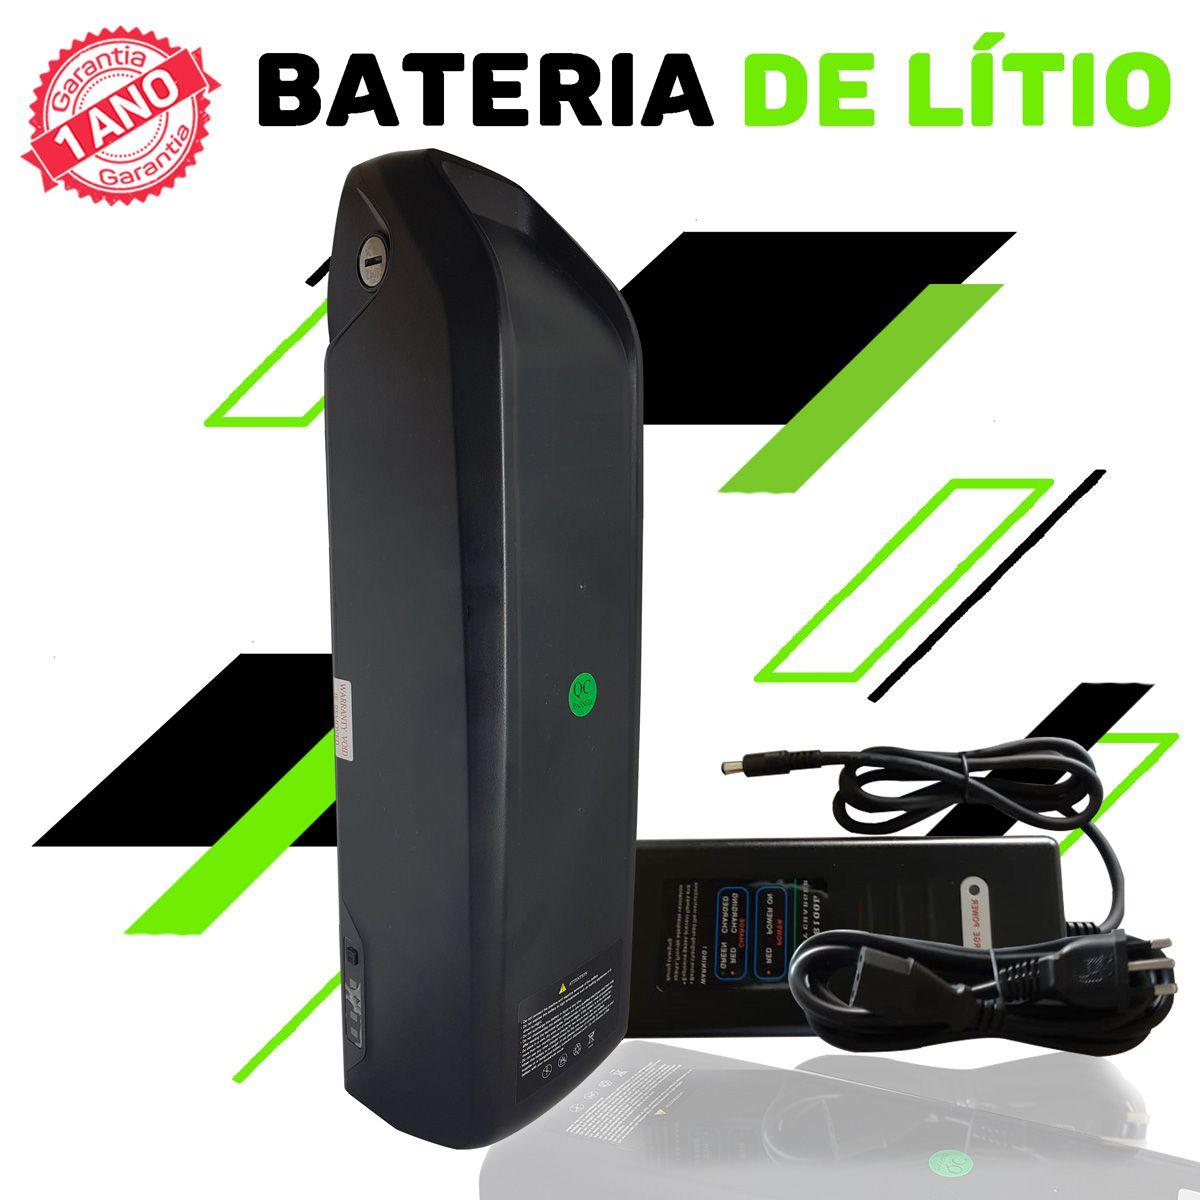 Kit Elétrico para Bicicleta - TecBike - Bateria Preta - 500 Watts 36V - Aro 700